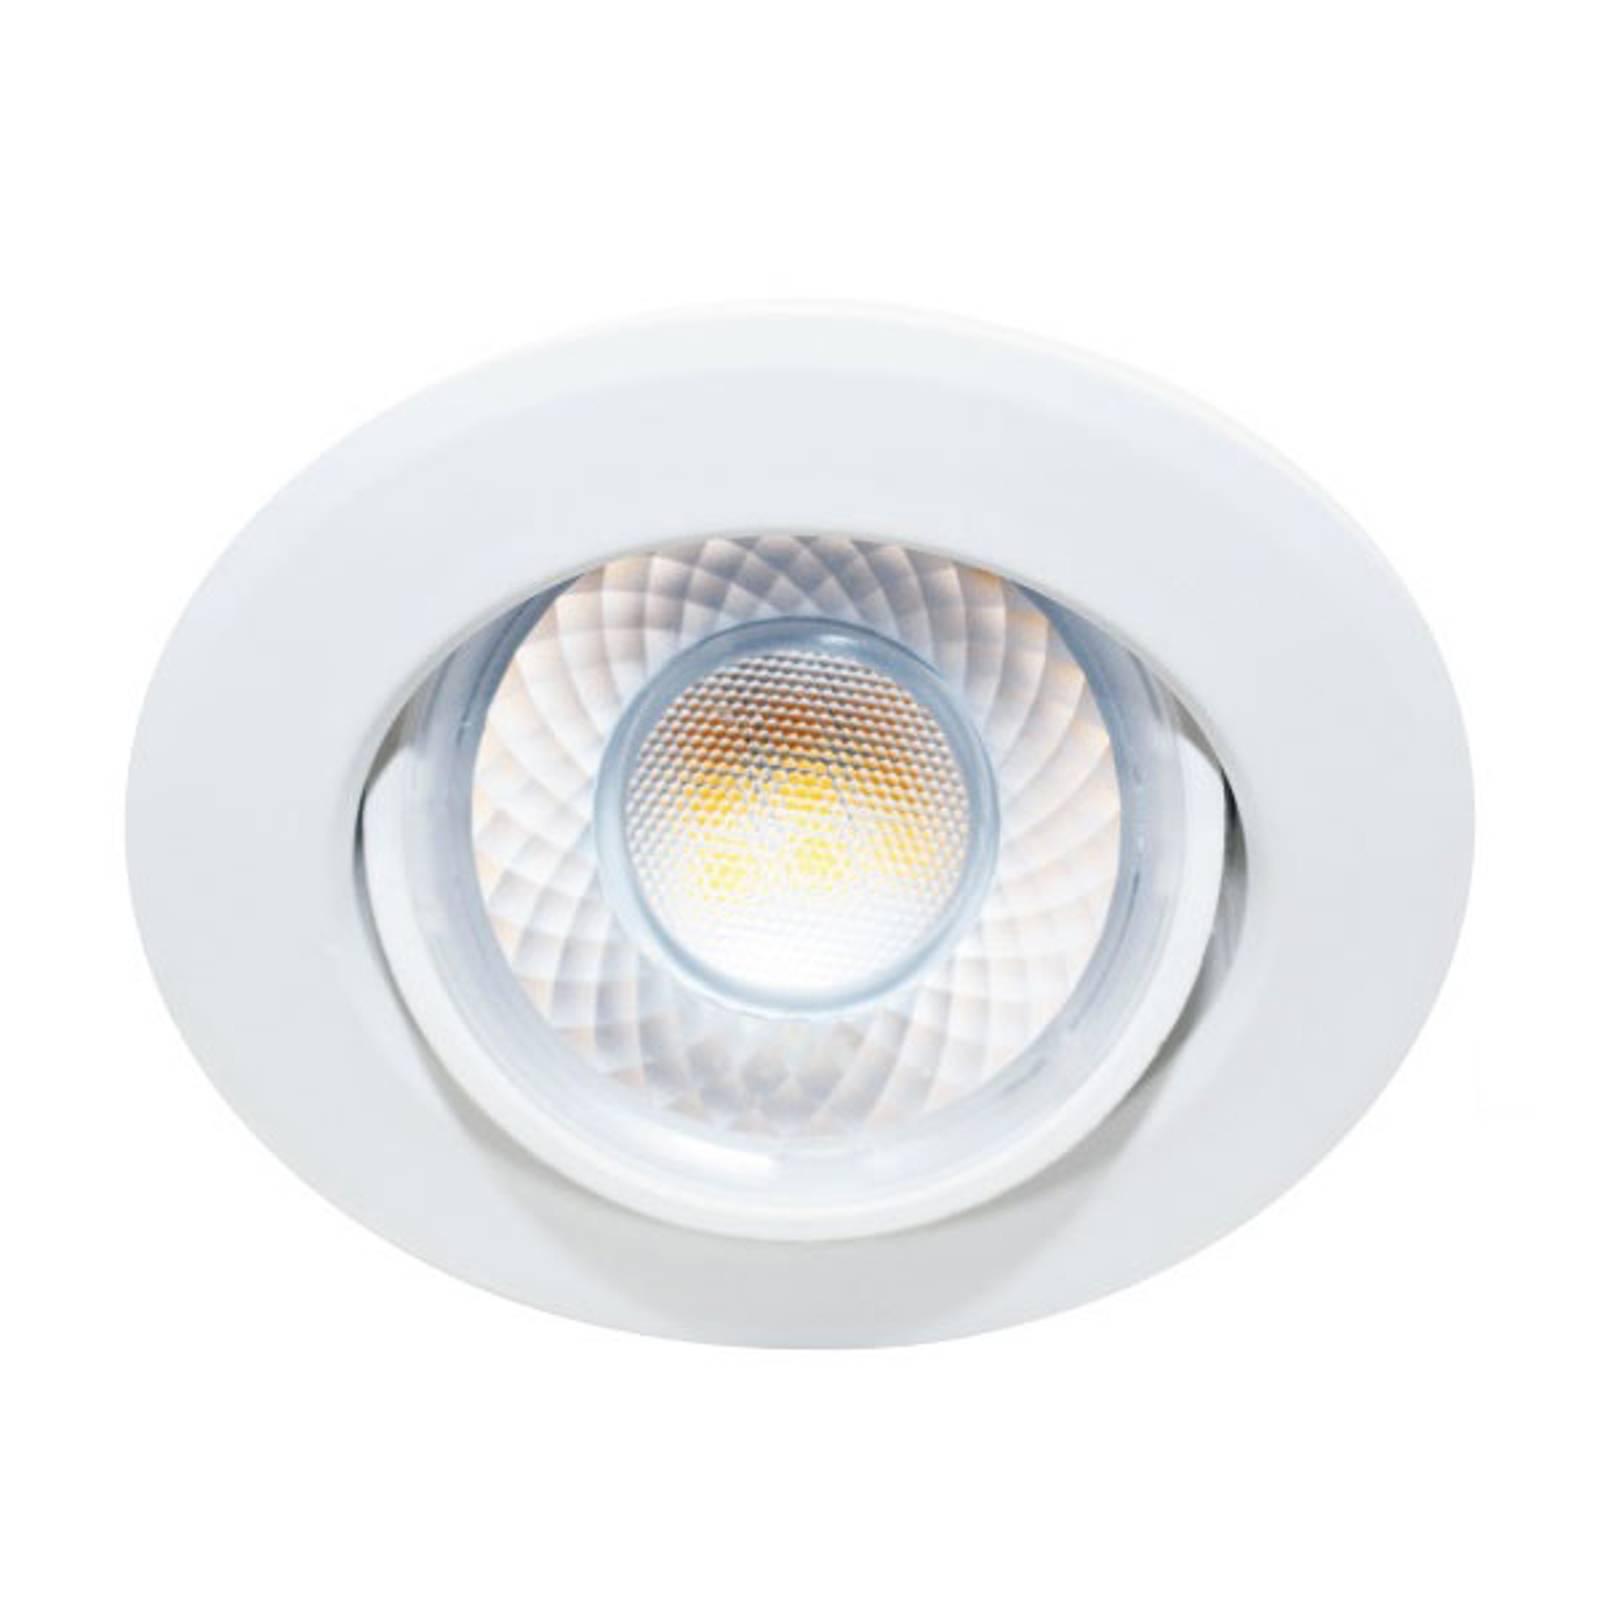 LED-uppokohdevalo Dekto 7,8cm 38° 8W Ra90 5000 K